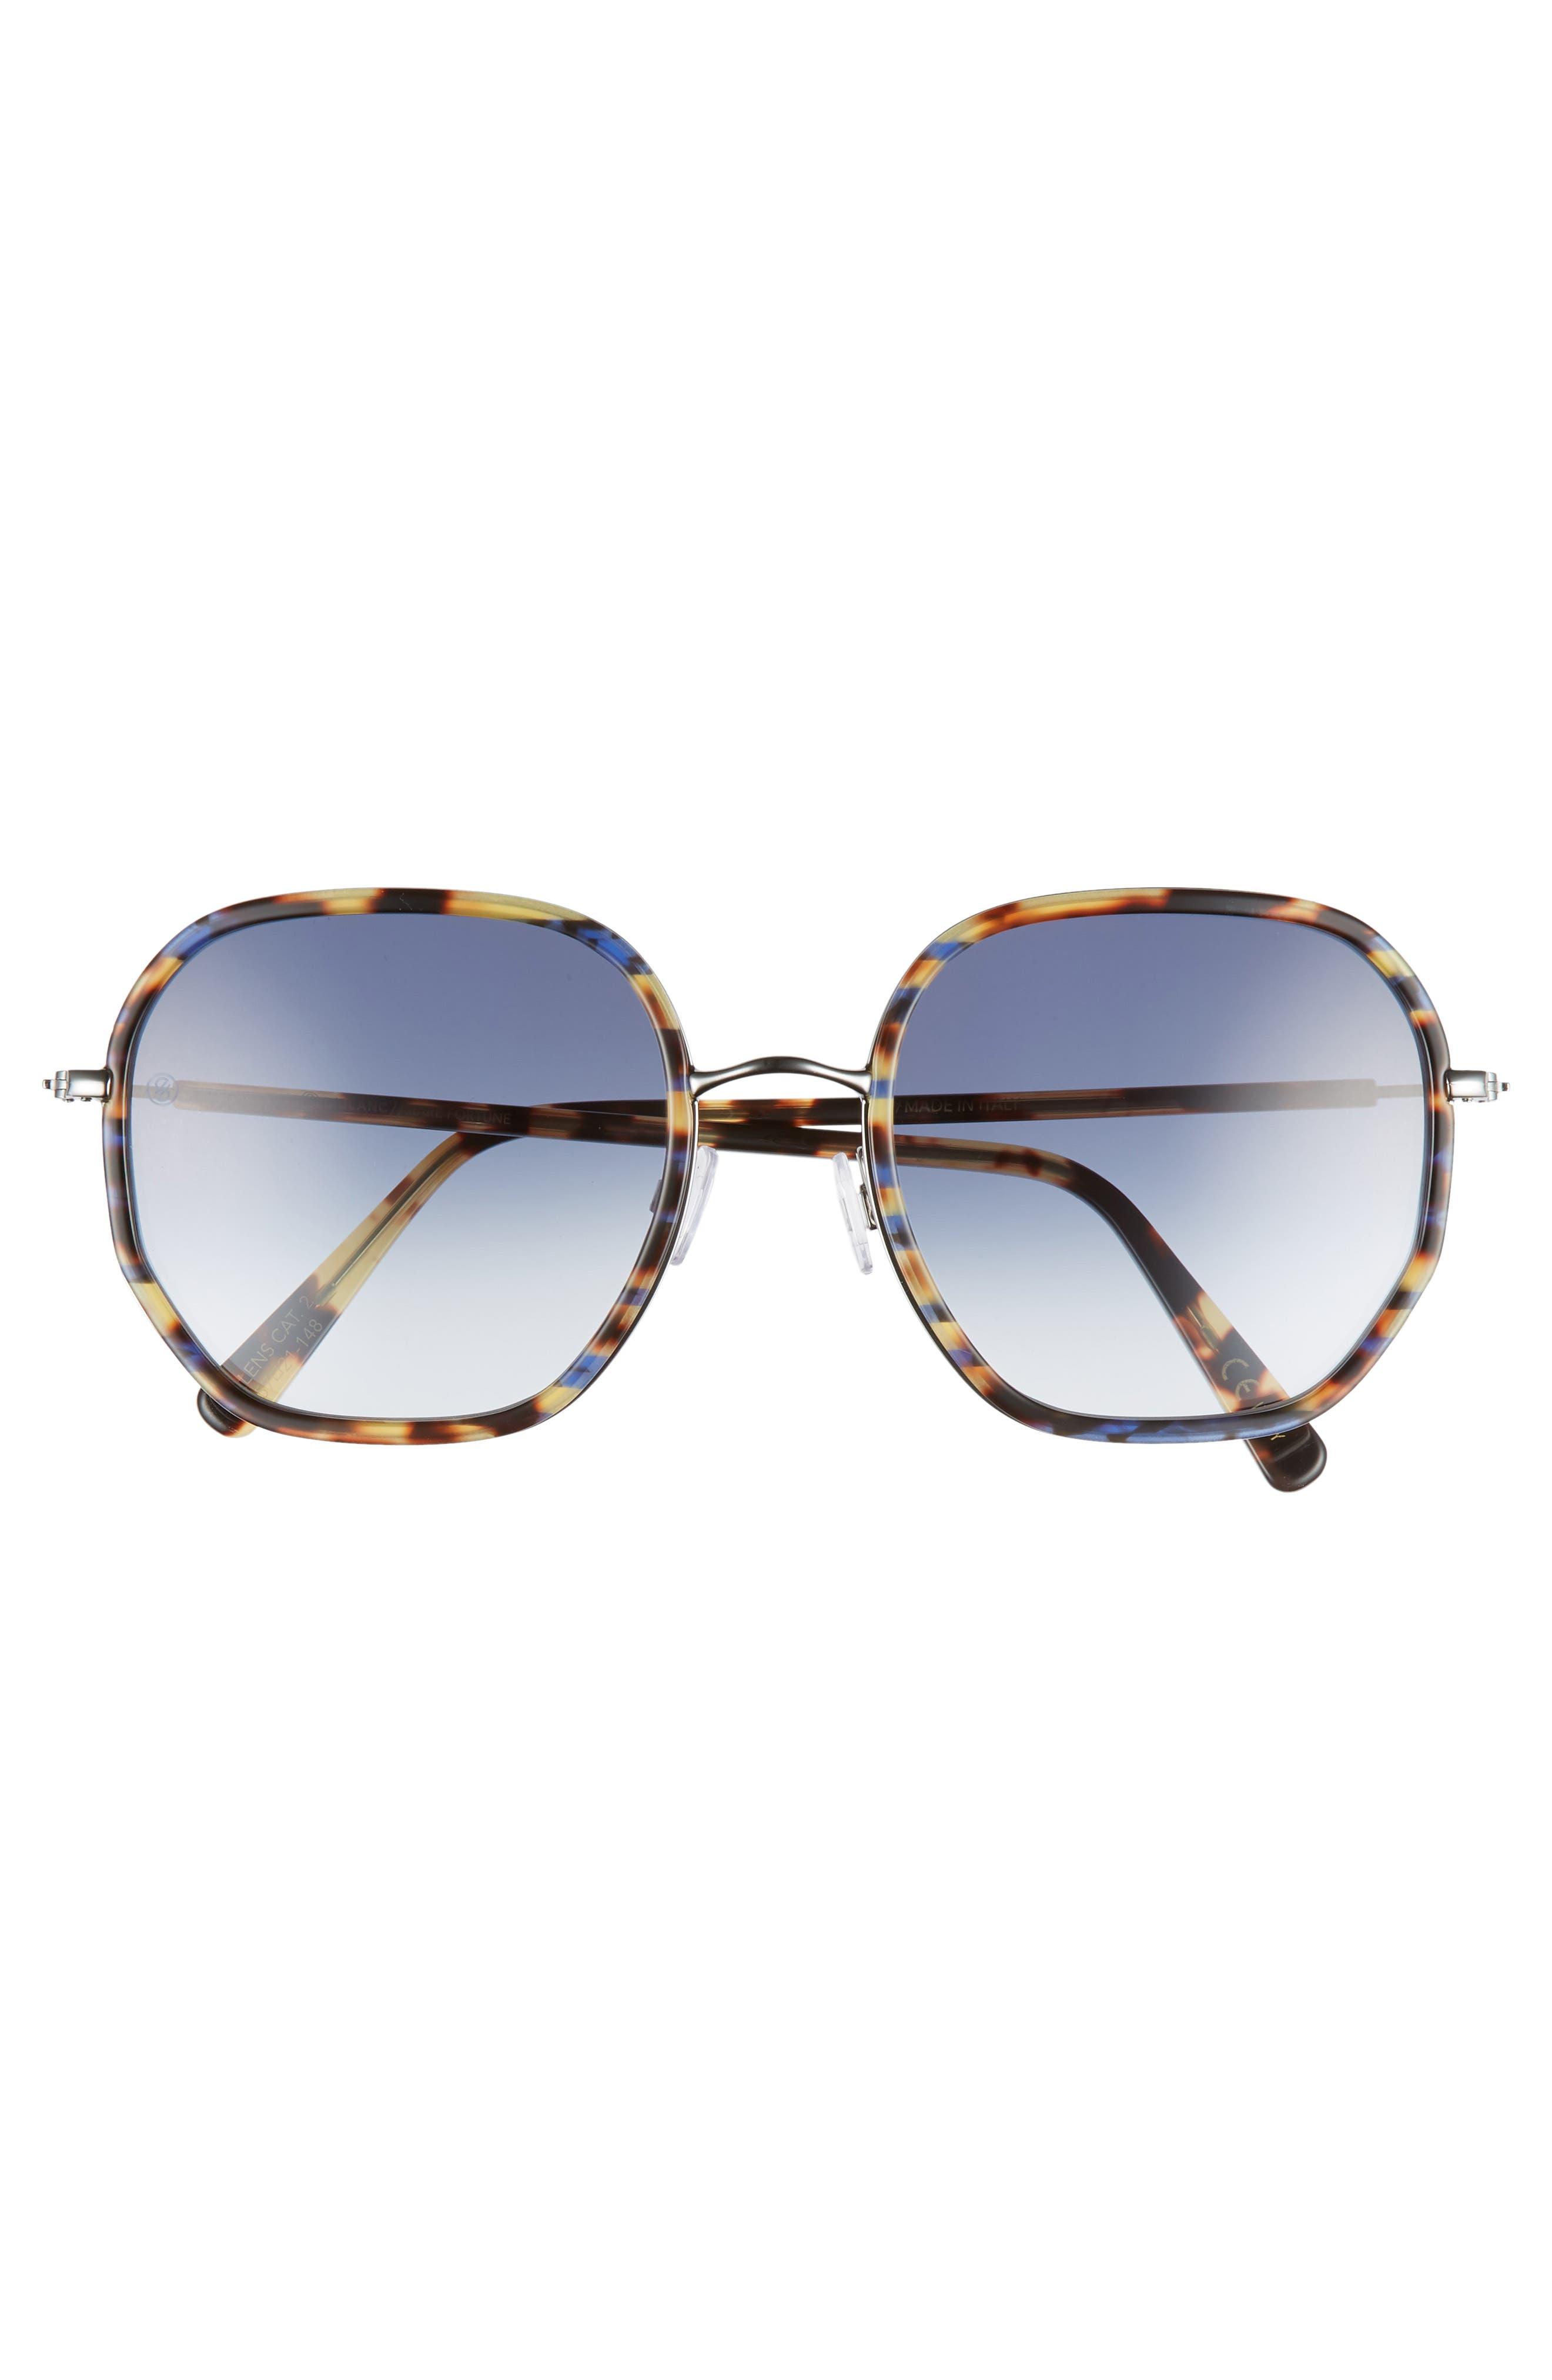 D'BLANC Rare Fortune 59mm Sunglasses,                             Alternate thumbnail 3, color,                             INDIGO TORTOISE